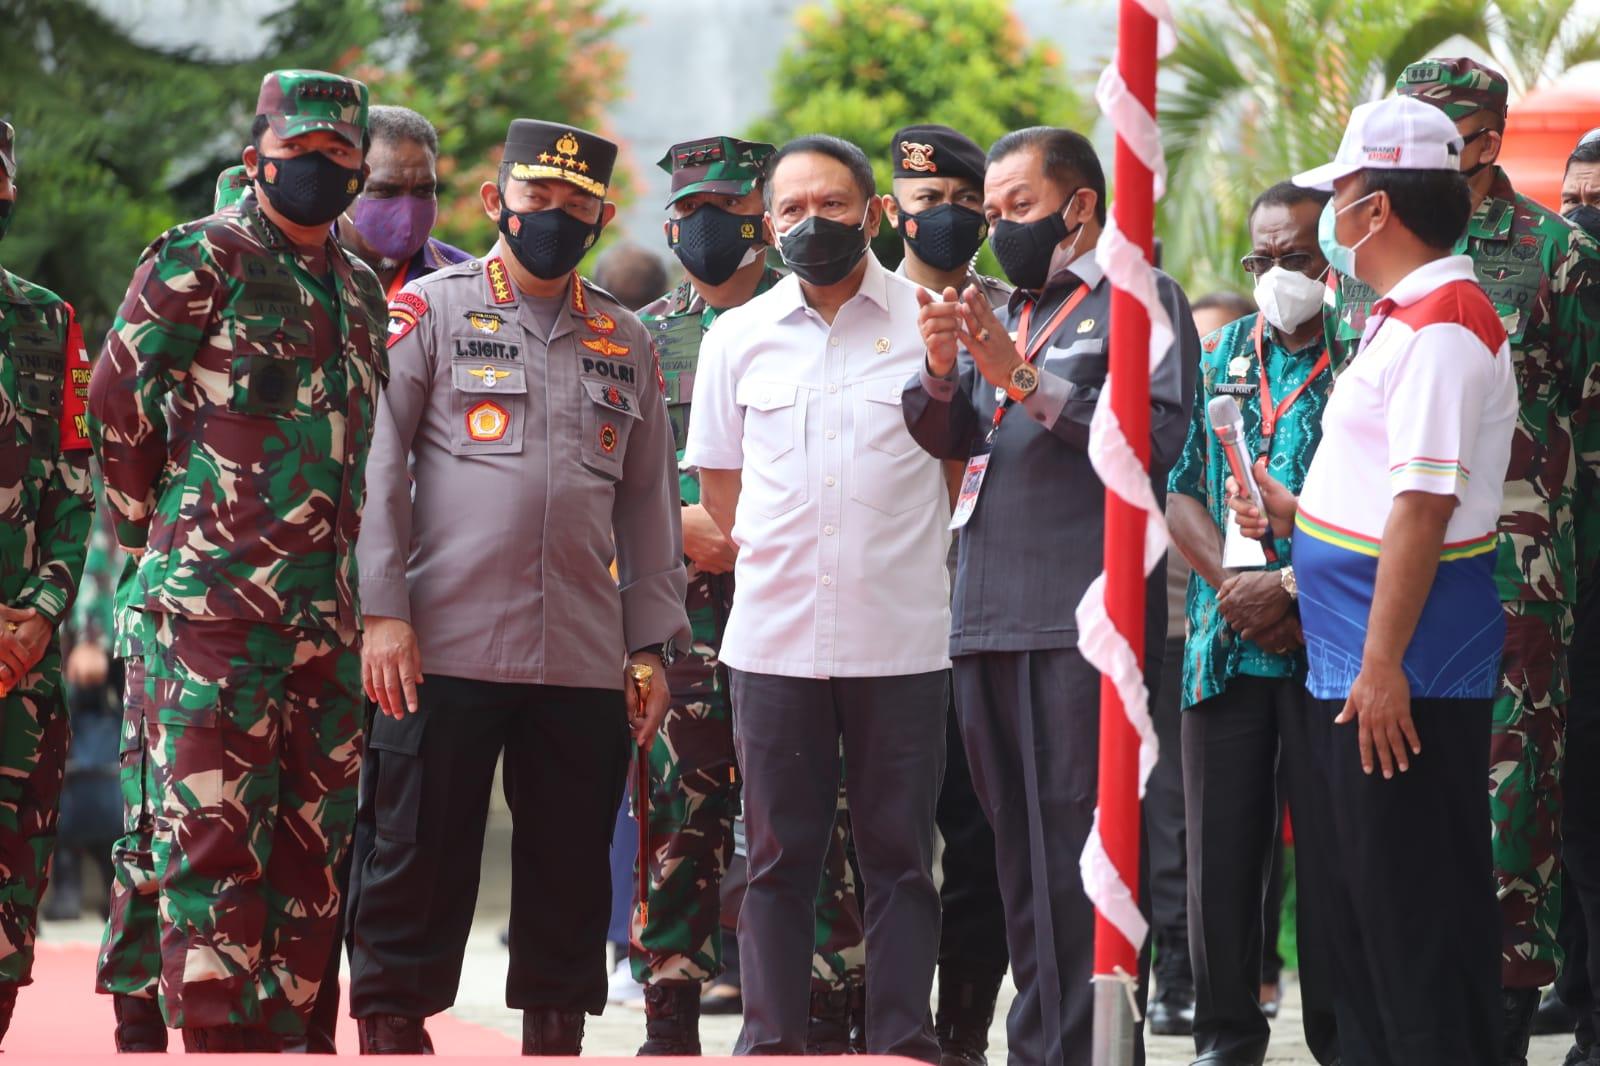 Bersama Kapolri & Panglima TNI, Menpora Amali Tinjau Vaksinasi Covid -19 di sekitar Venue PON Papua